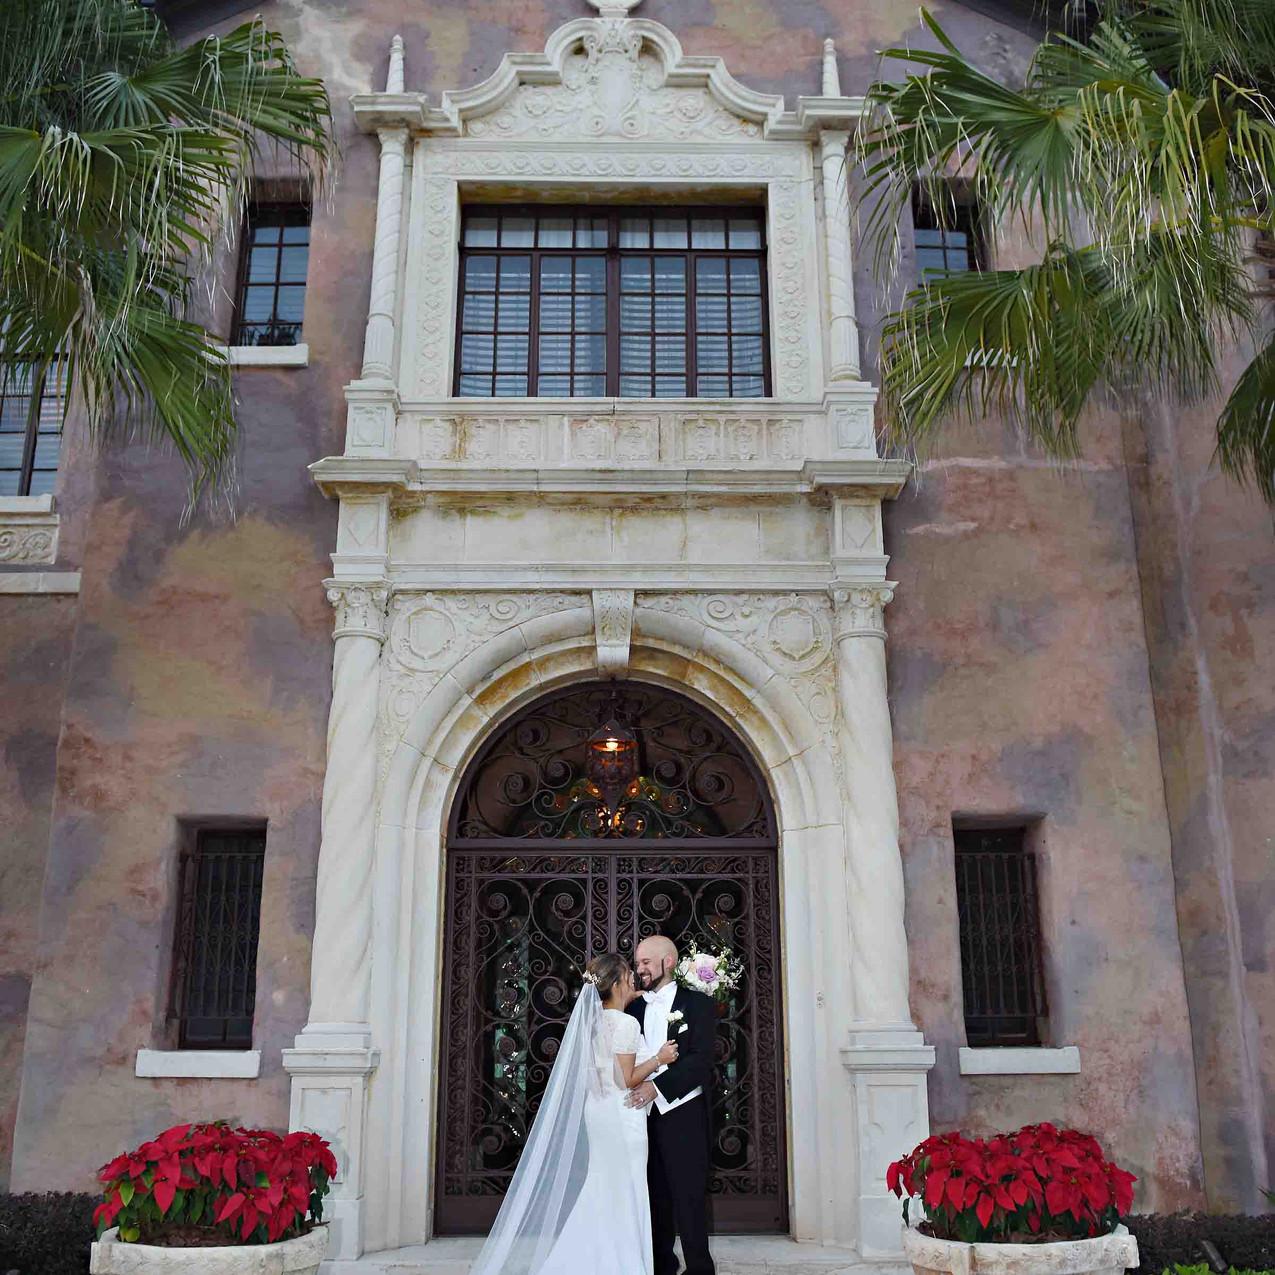 Gorgeous Howey Mansion!